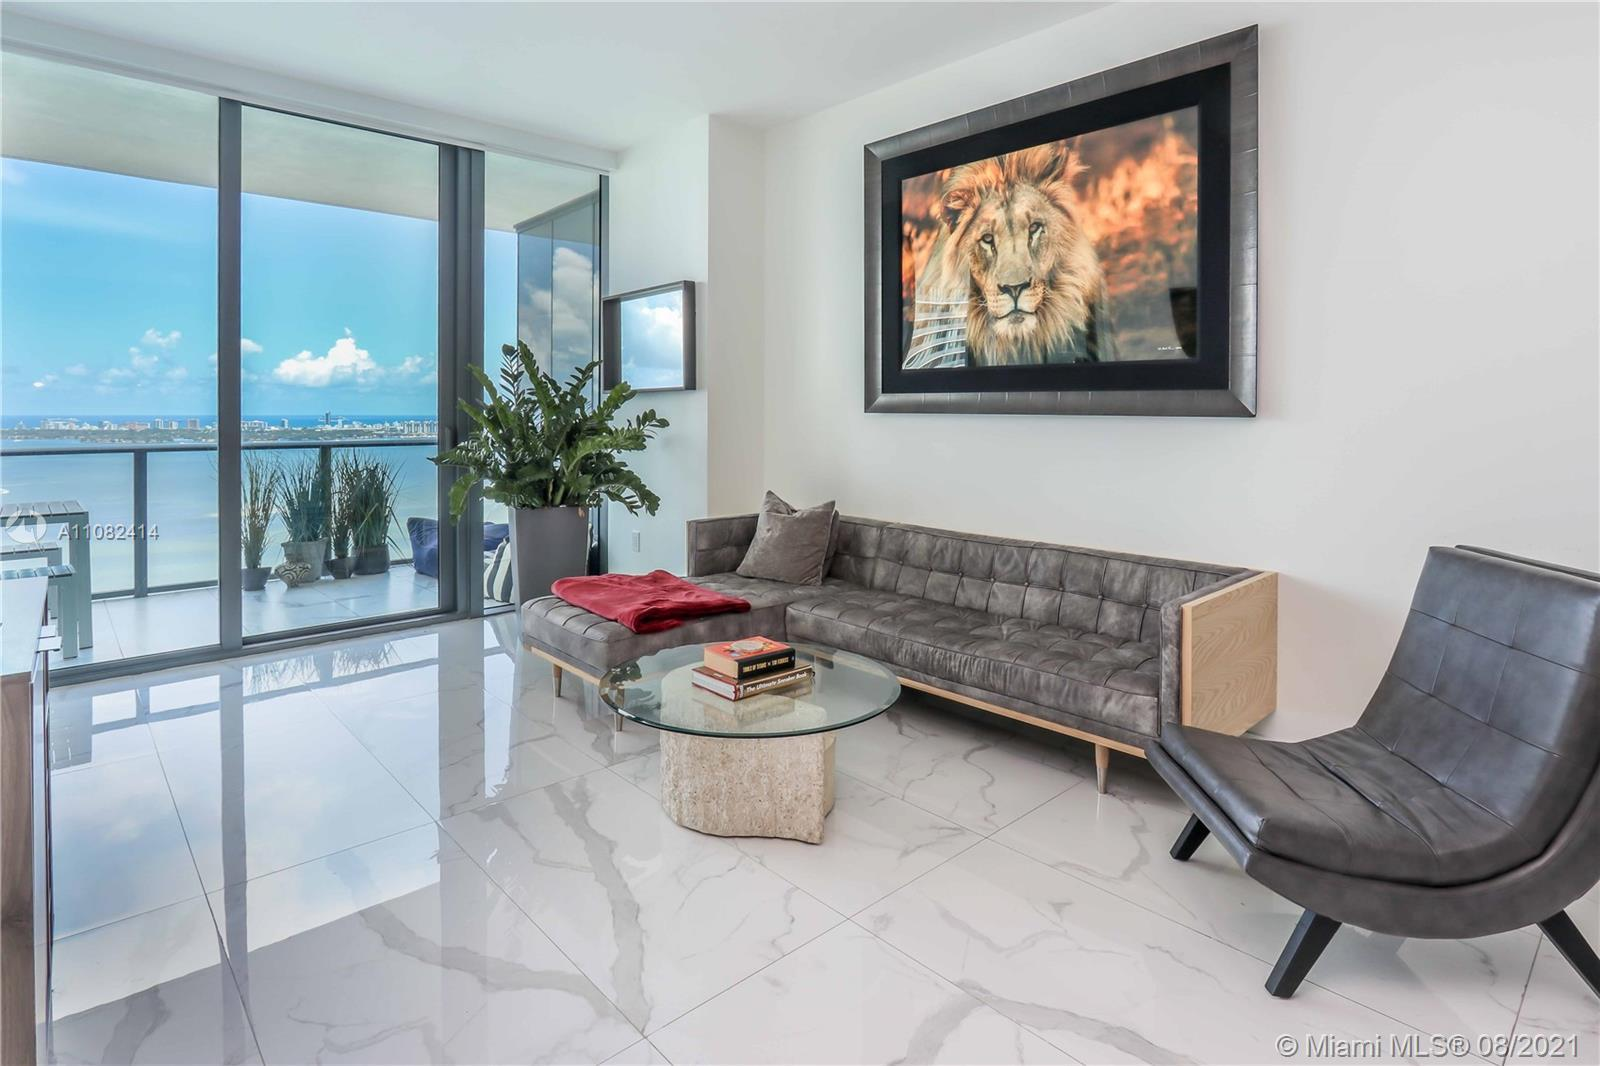 Gorgeous high floor 03' line at Gran Paraiso Residences in Miami's Edgewater District. This floorpla